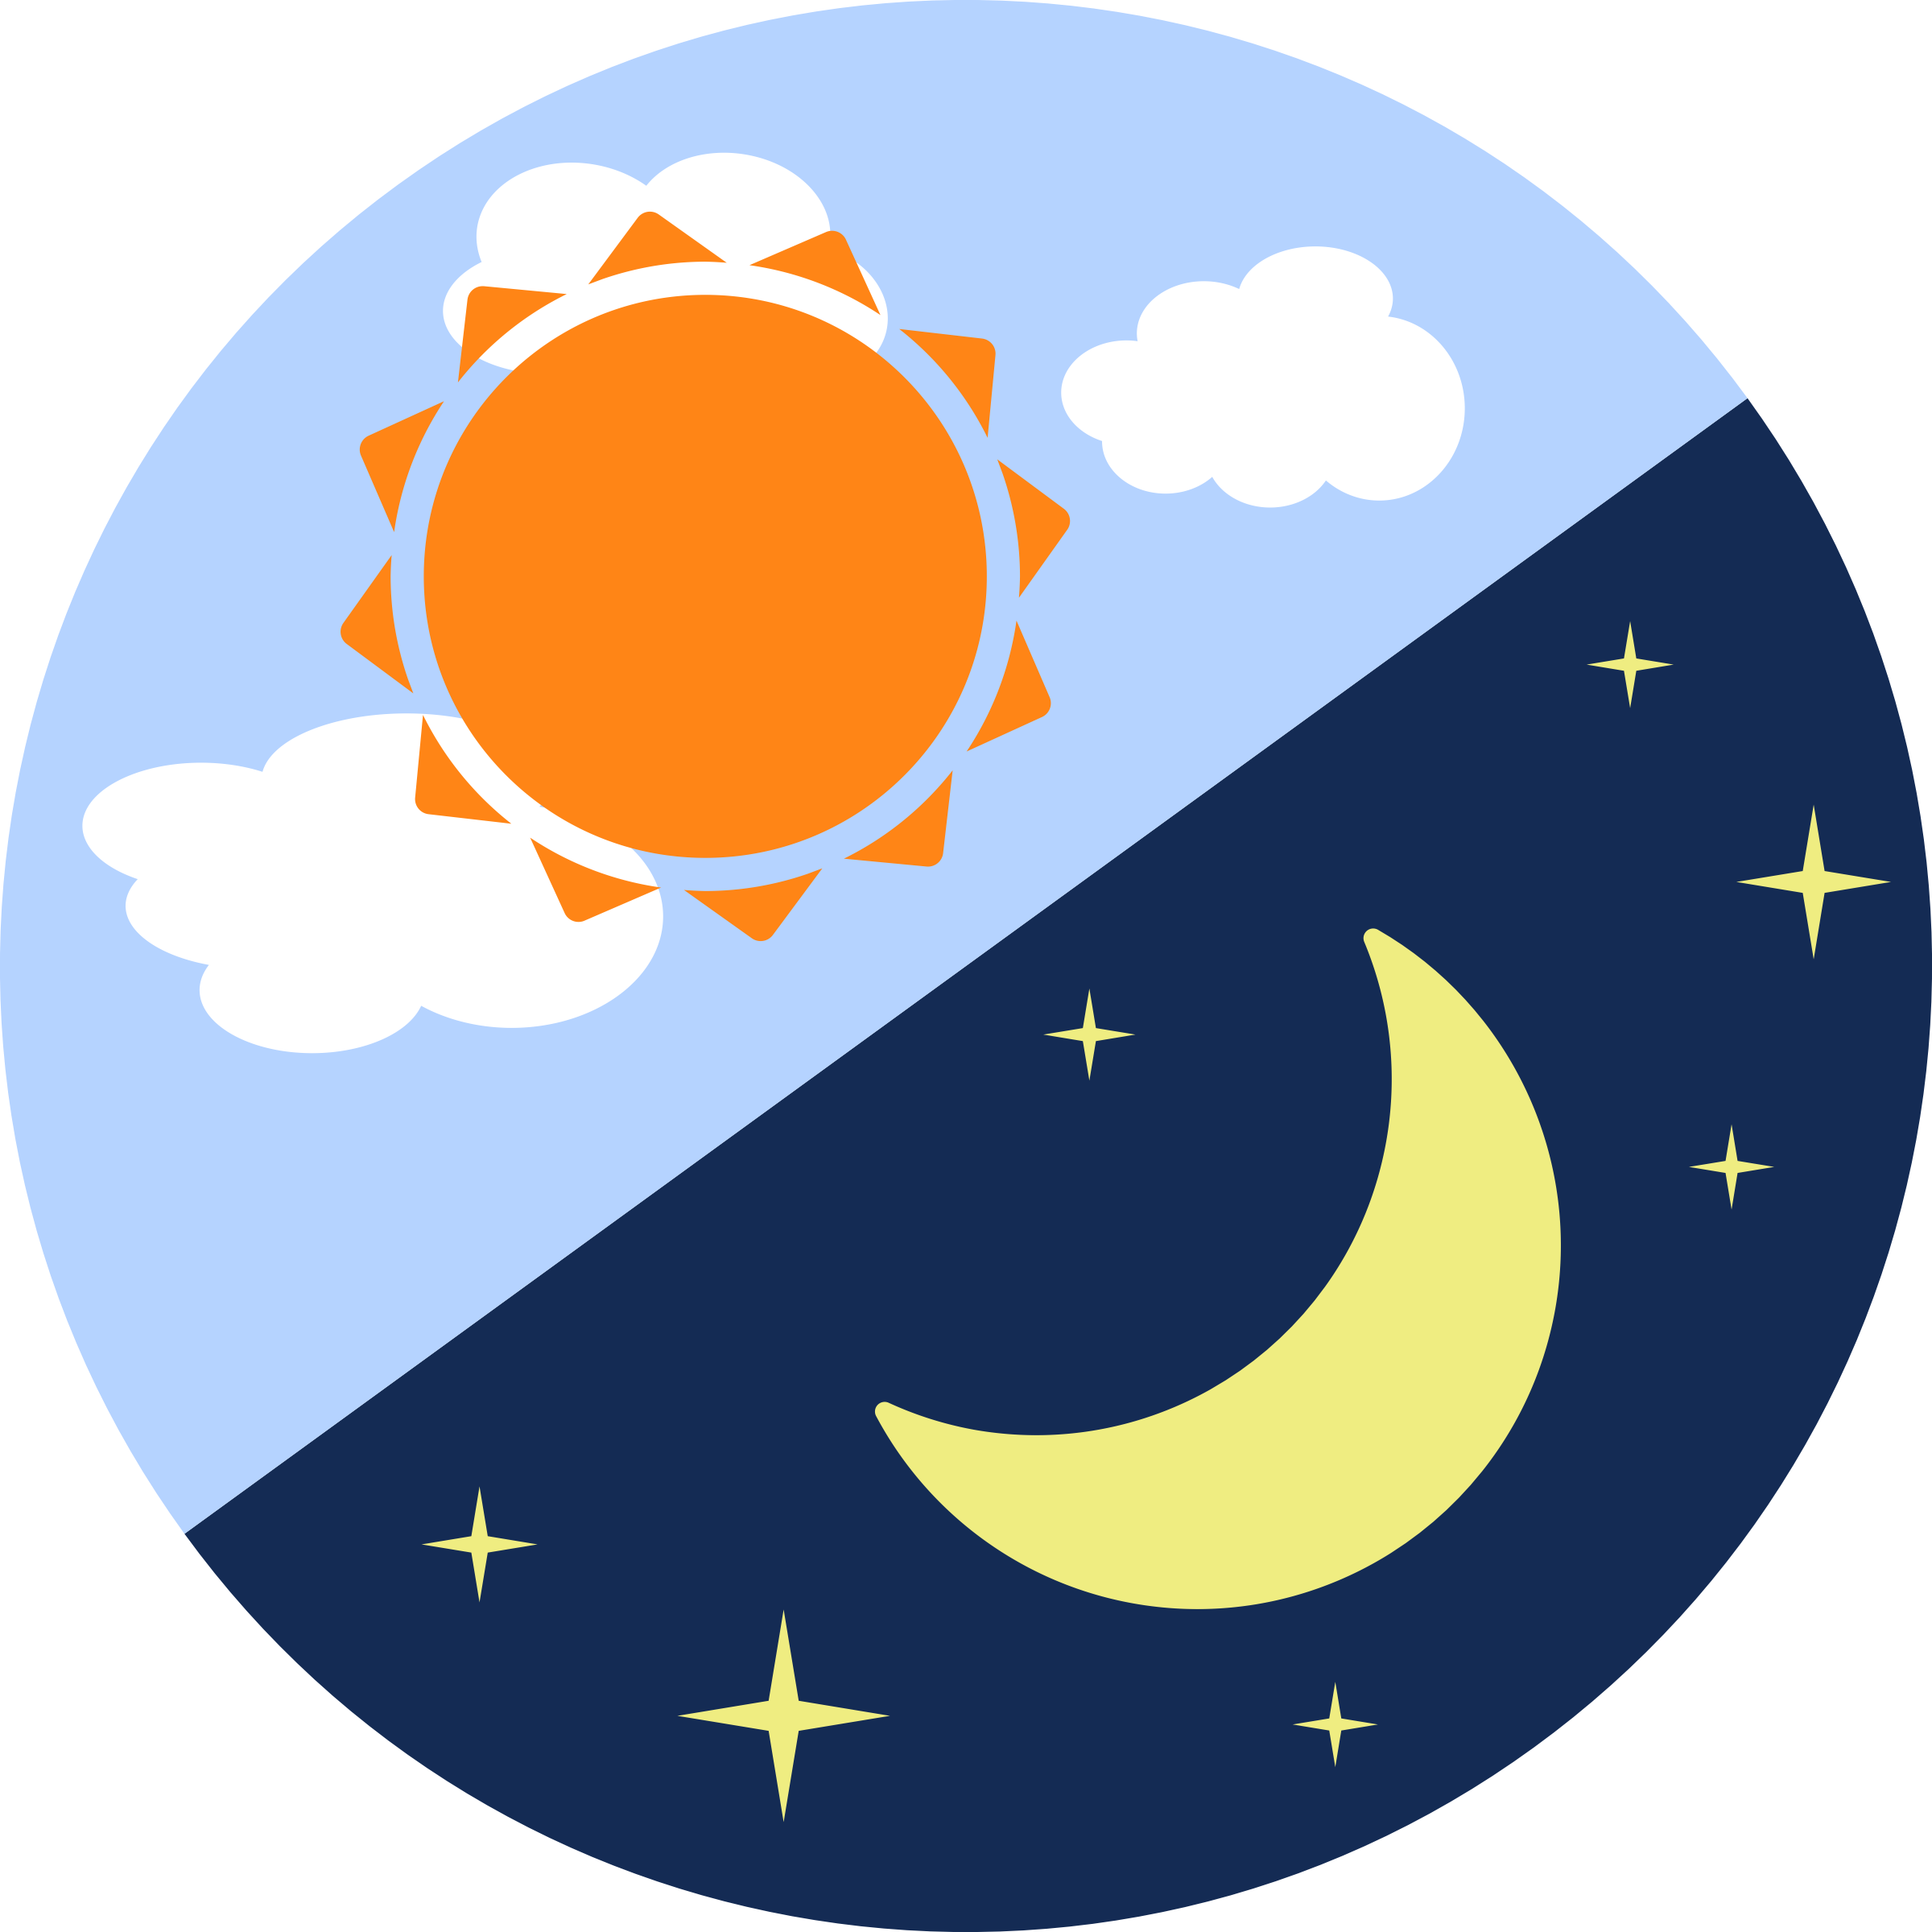 Clipart moon tonight, Clipart moon tonight Transparent FREE.